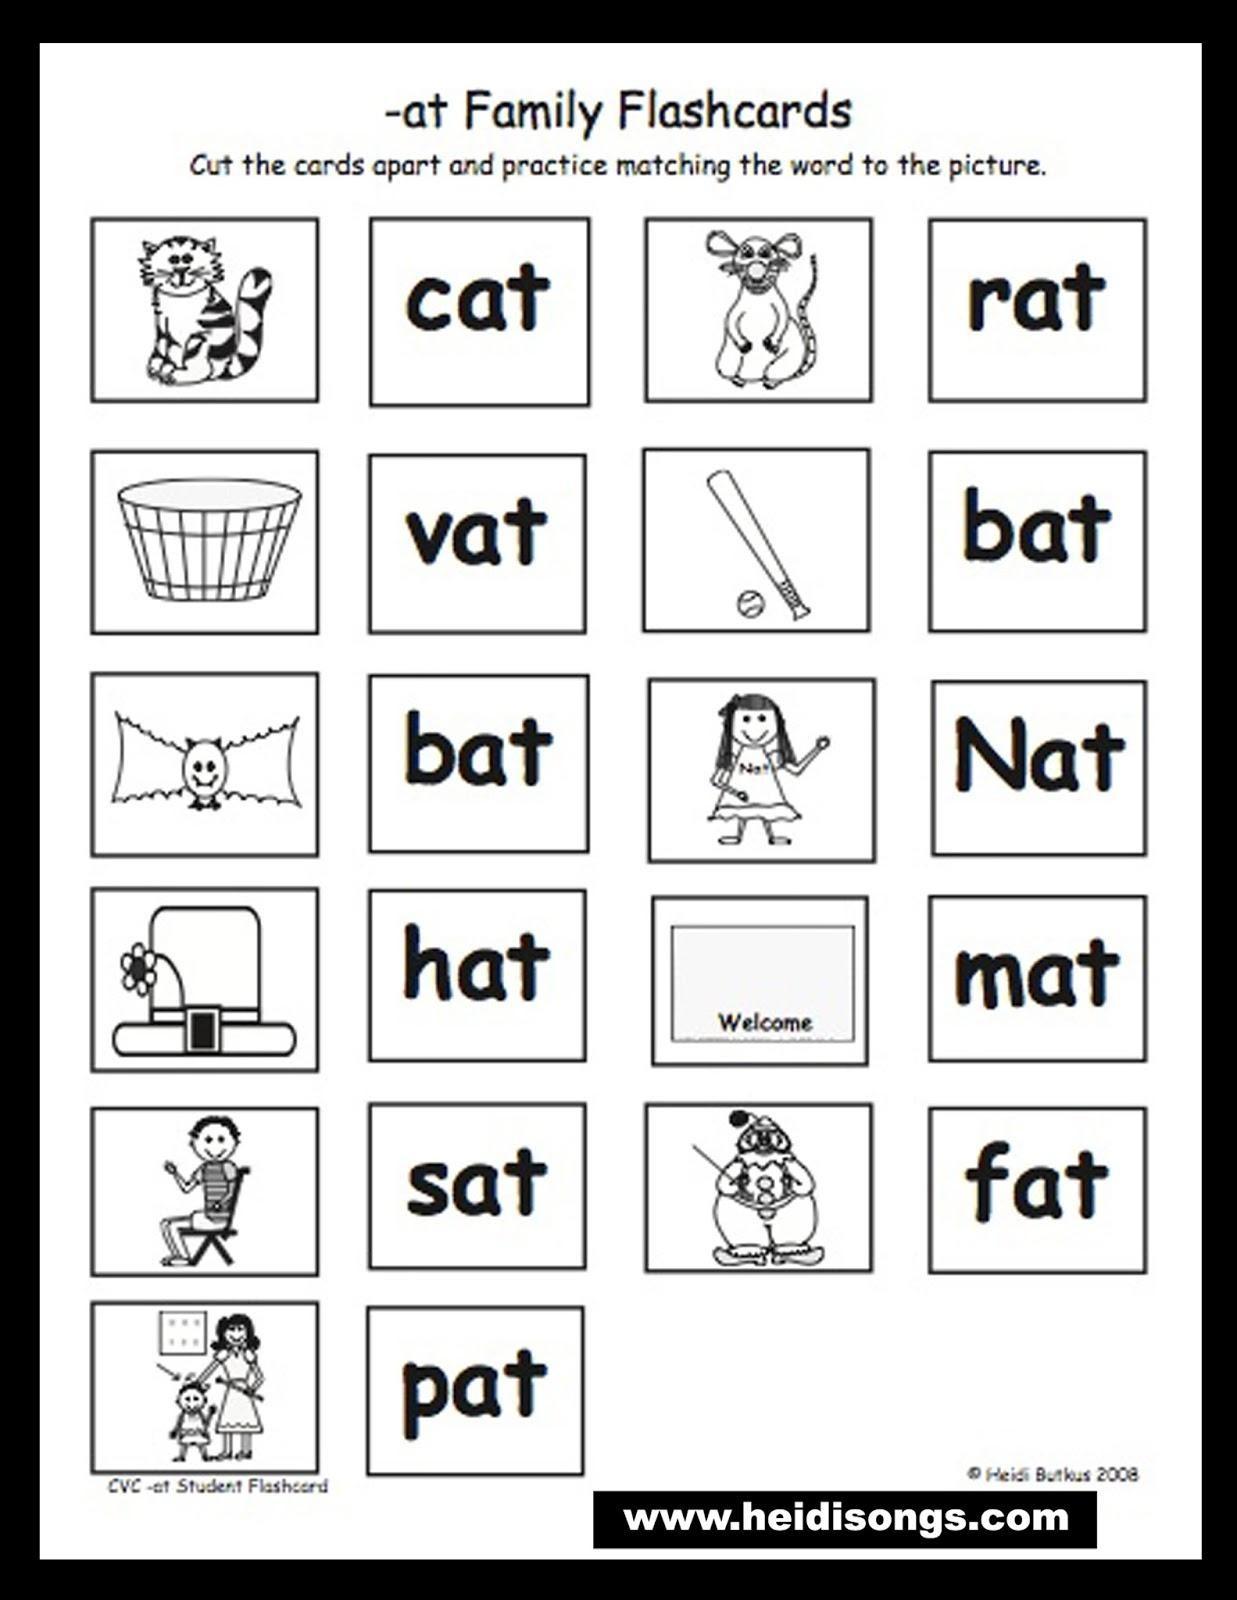 36 Math Practice Worksheets For Kindergarten – Worksheet Template - Free Printable Word Family Worksheets For Kindergarten